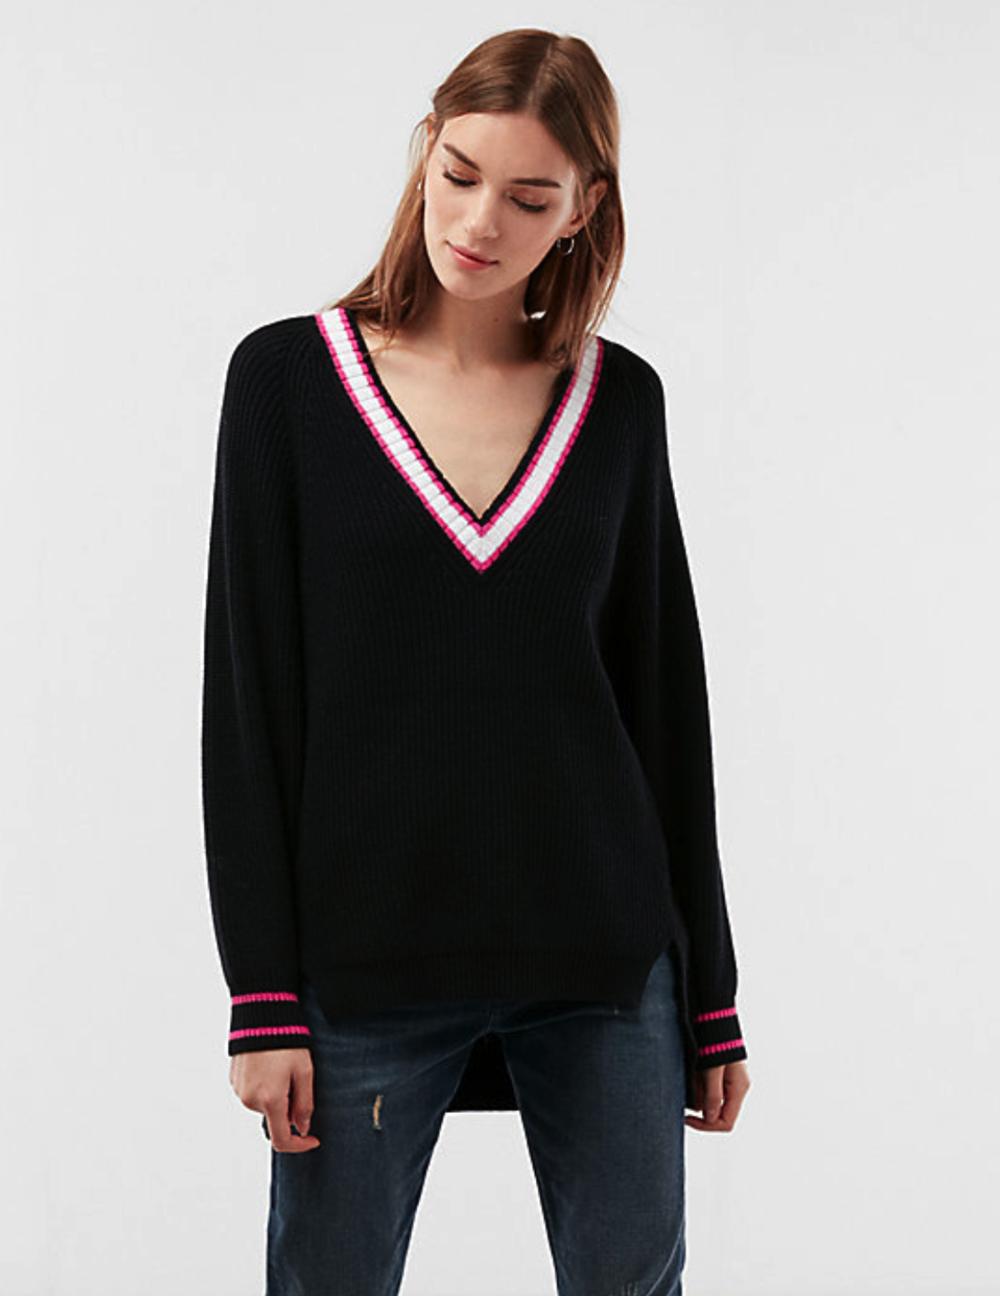 Oversized Striped Deep V-Neck Tunic Sweater